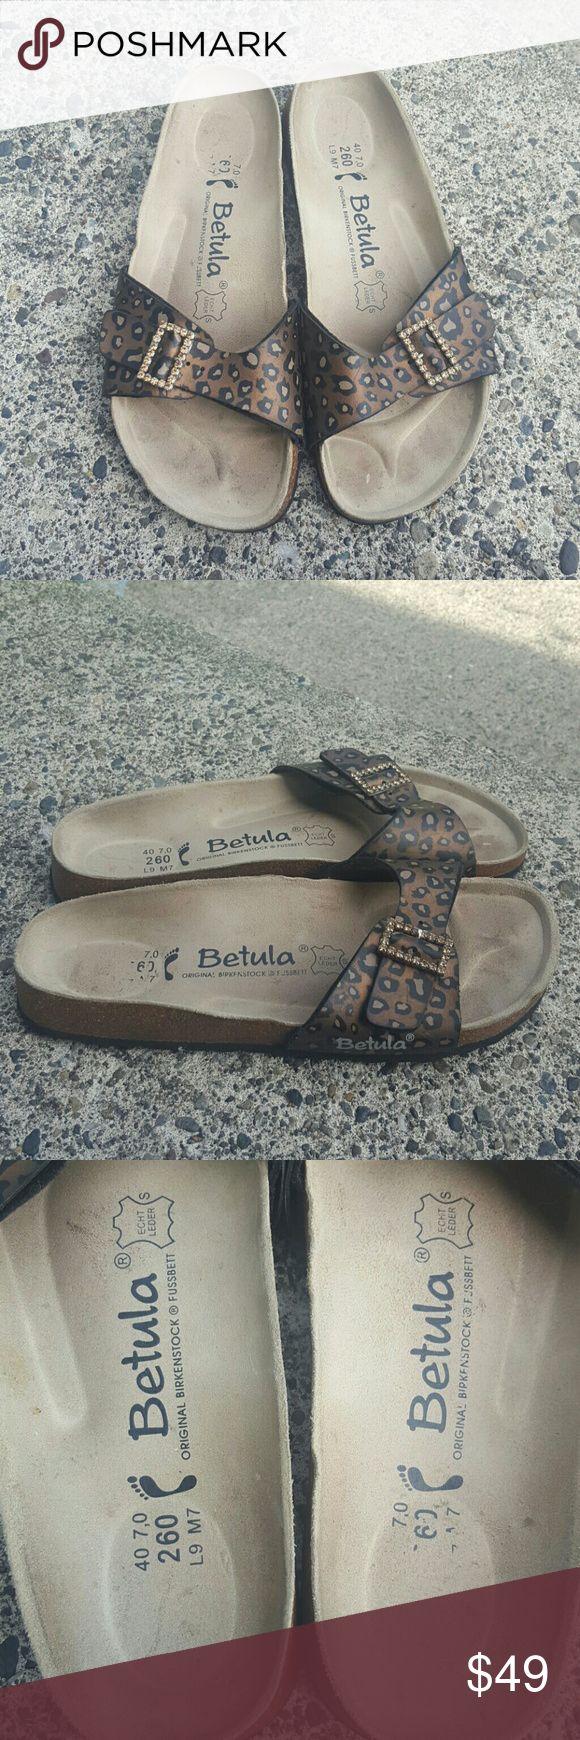 Birkenstock betula sandals Women's size 40 US size ladies 9 in excellent condition,  lightly used , leopard print Birkenstock Shoes Sandals